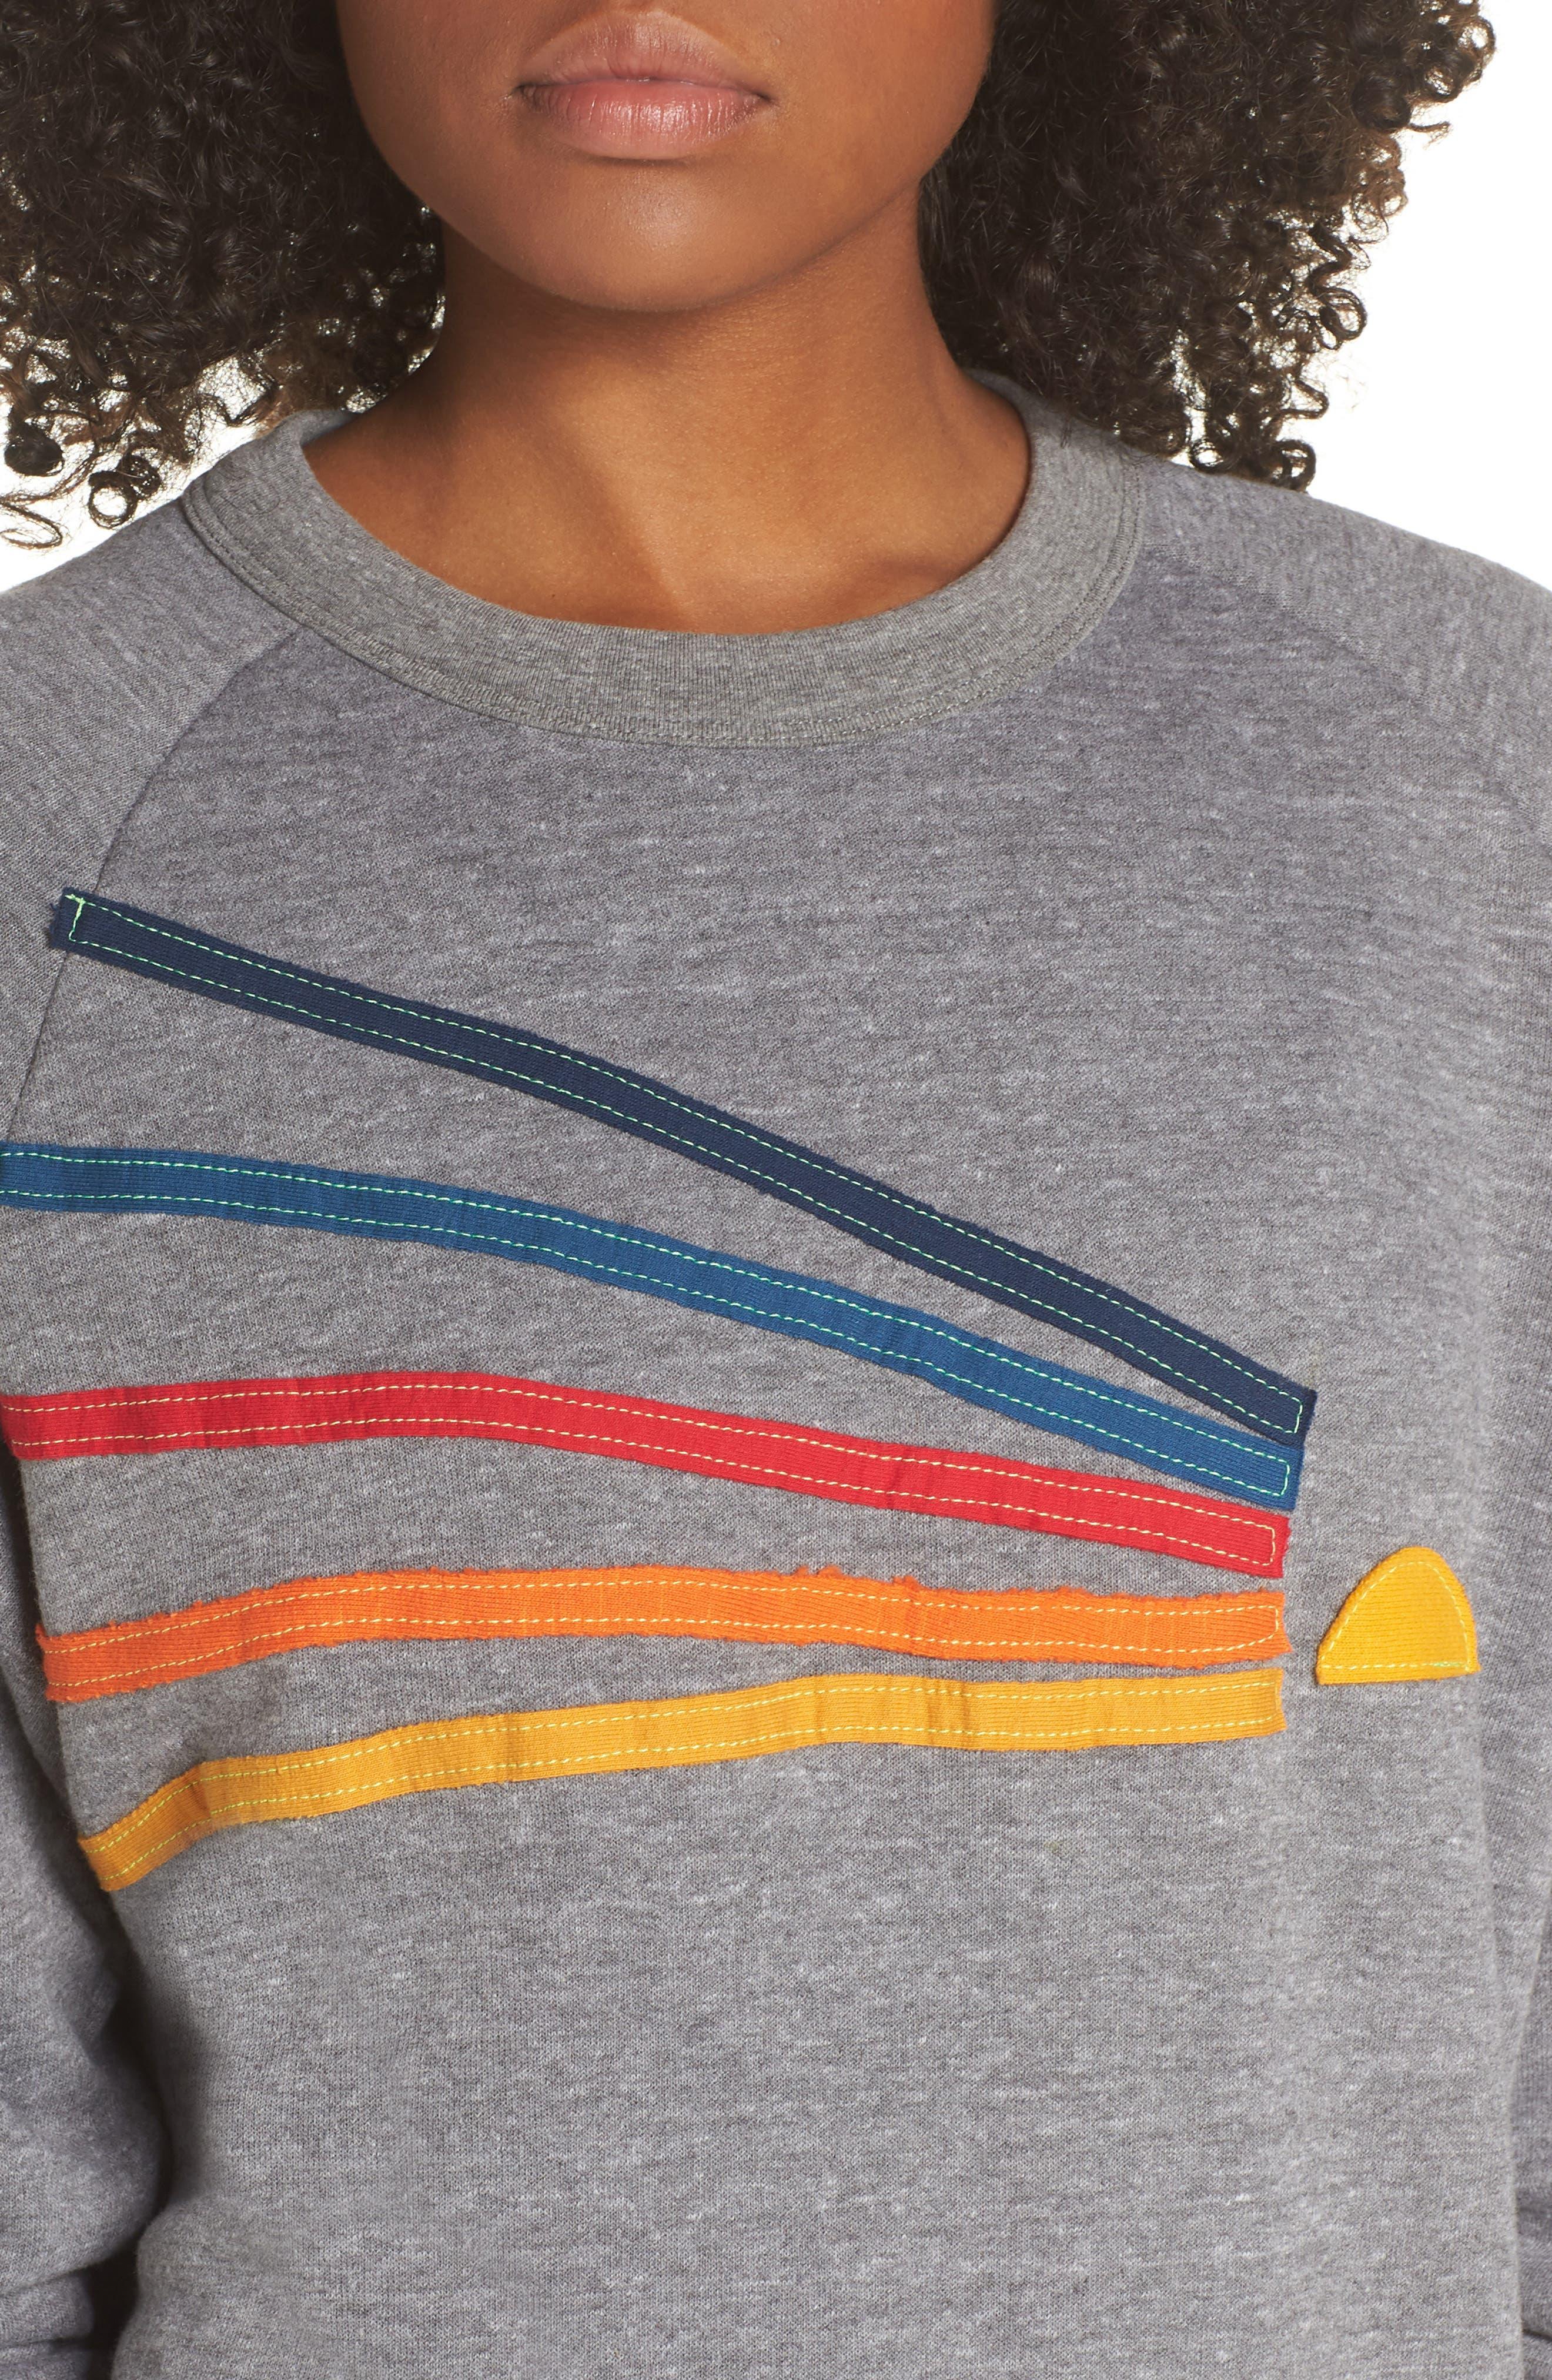 Daydream Sweatshirt,                             Alternate thumbnail 4, color,                             HEATHER GREY